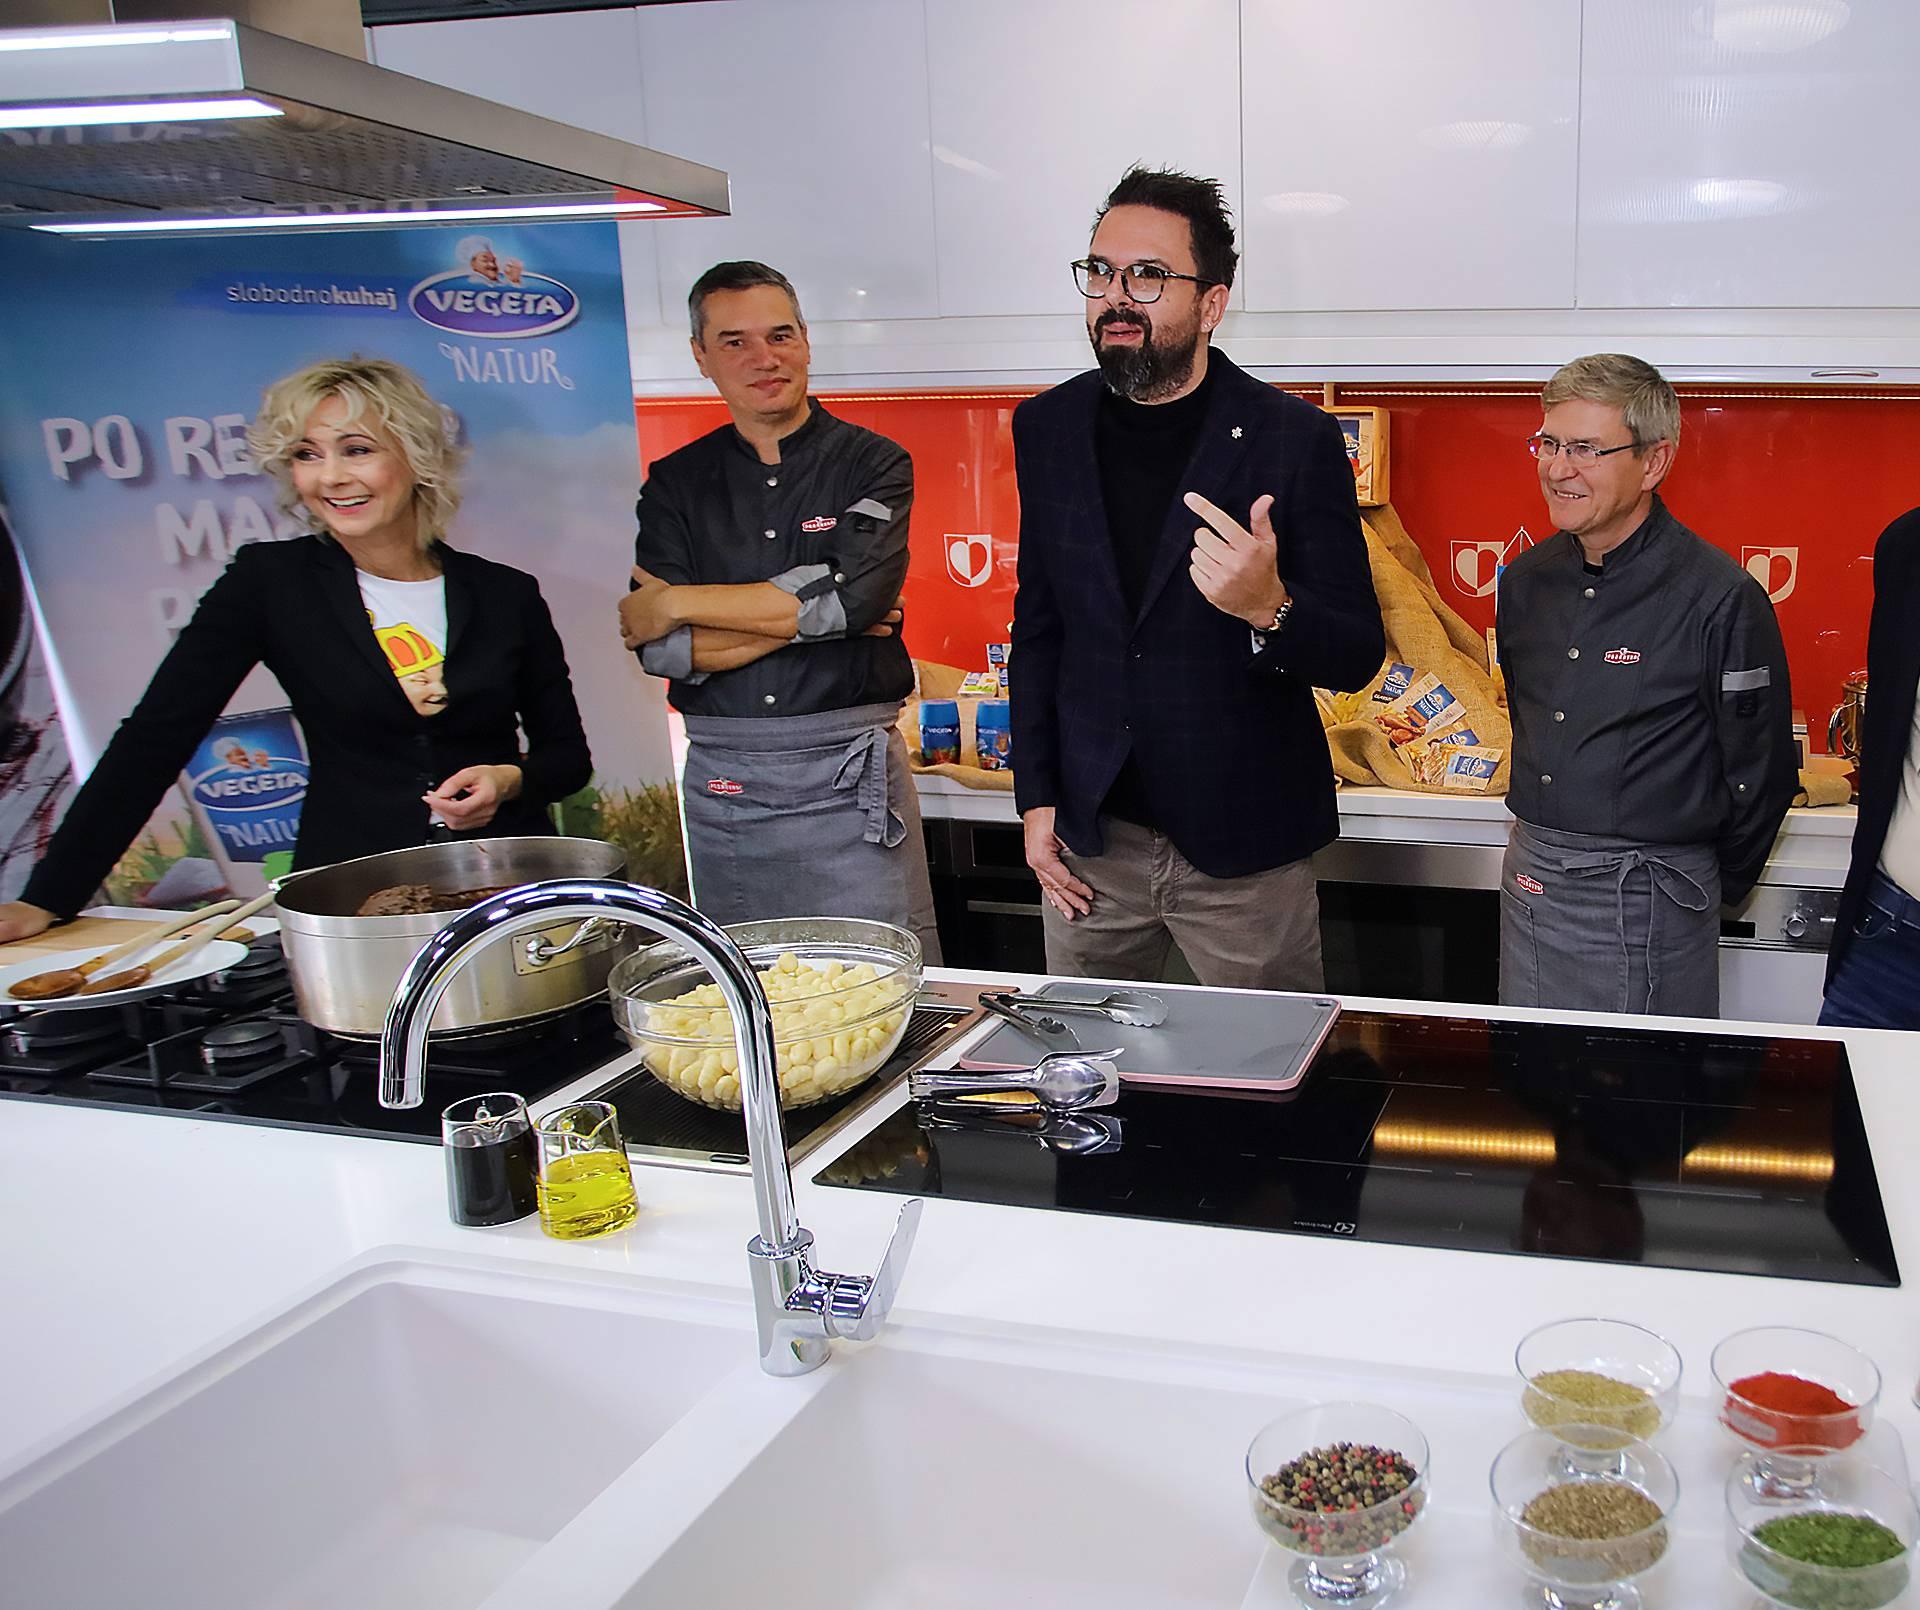 Podravka i Petar Grašo: razvoj Vegeta natur  dodatka jelima